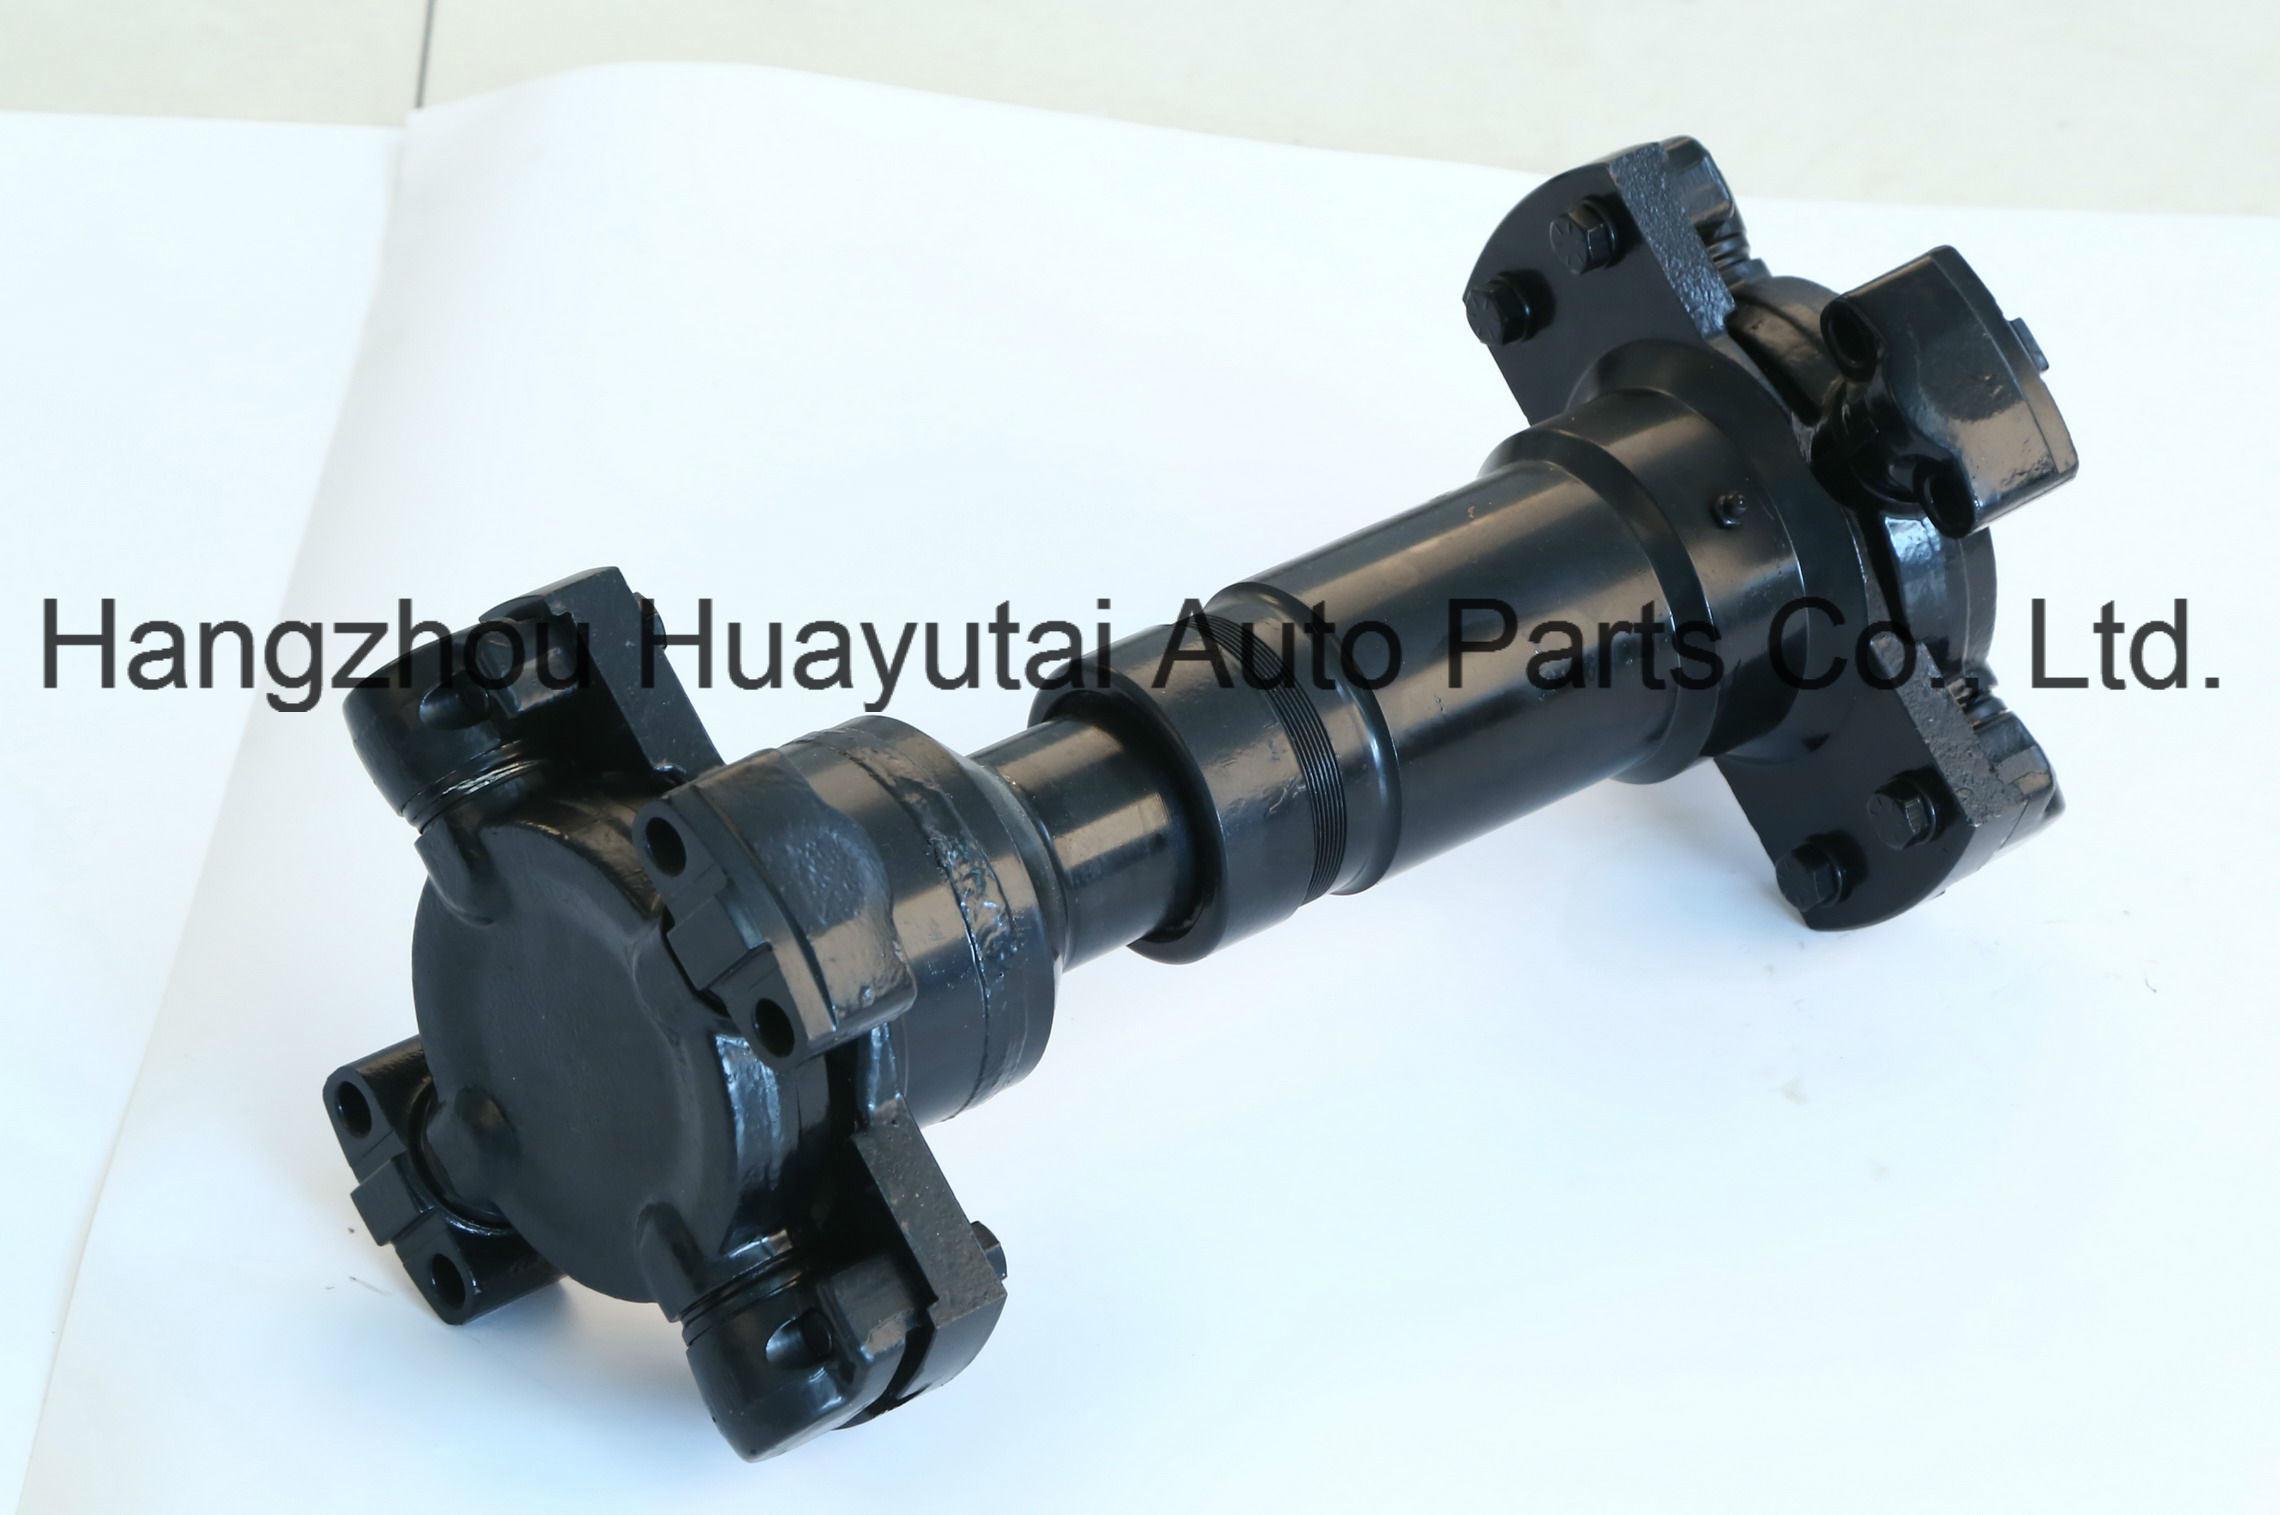 Terex Universal Joints, Drive Shafts, Propeller Shaft